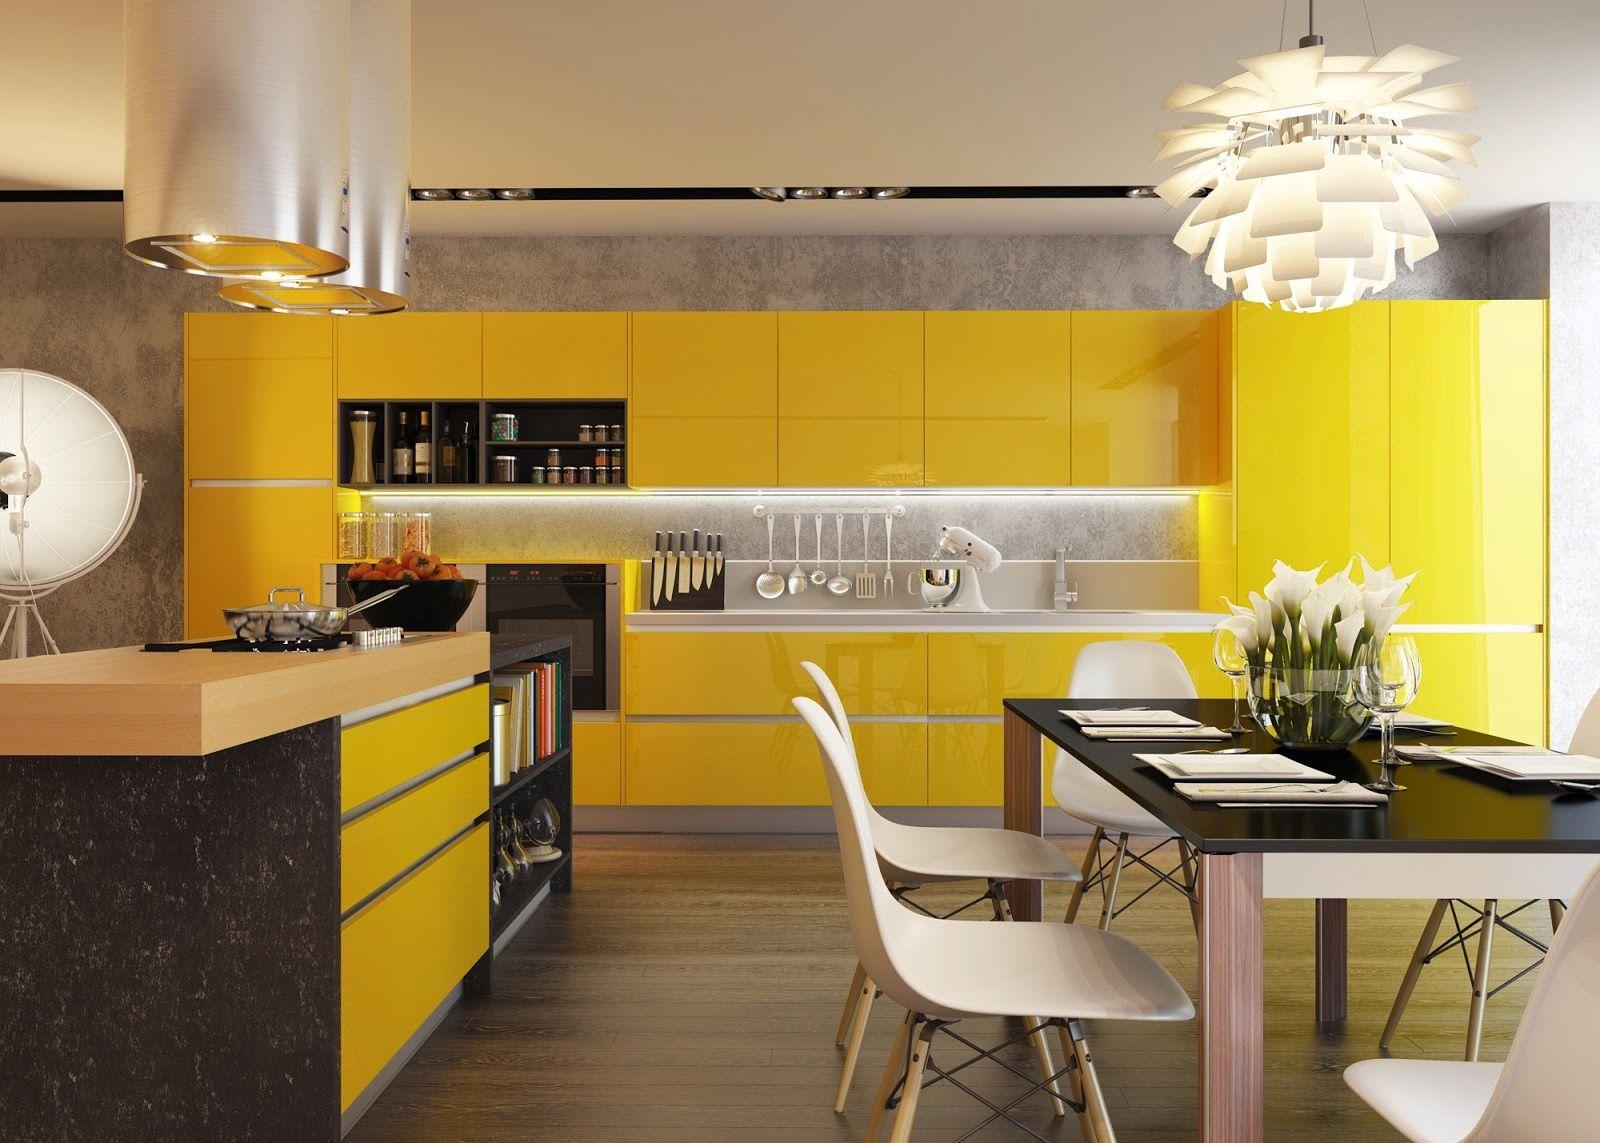 Yellow Kitchen Decor Bright Yellow Kitchen Cabinets  Google Search  House Ideas